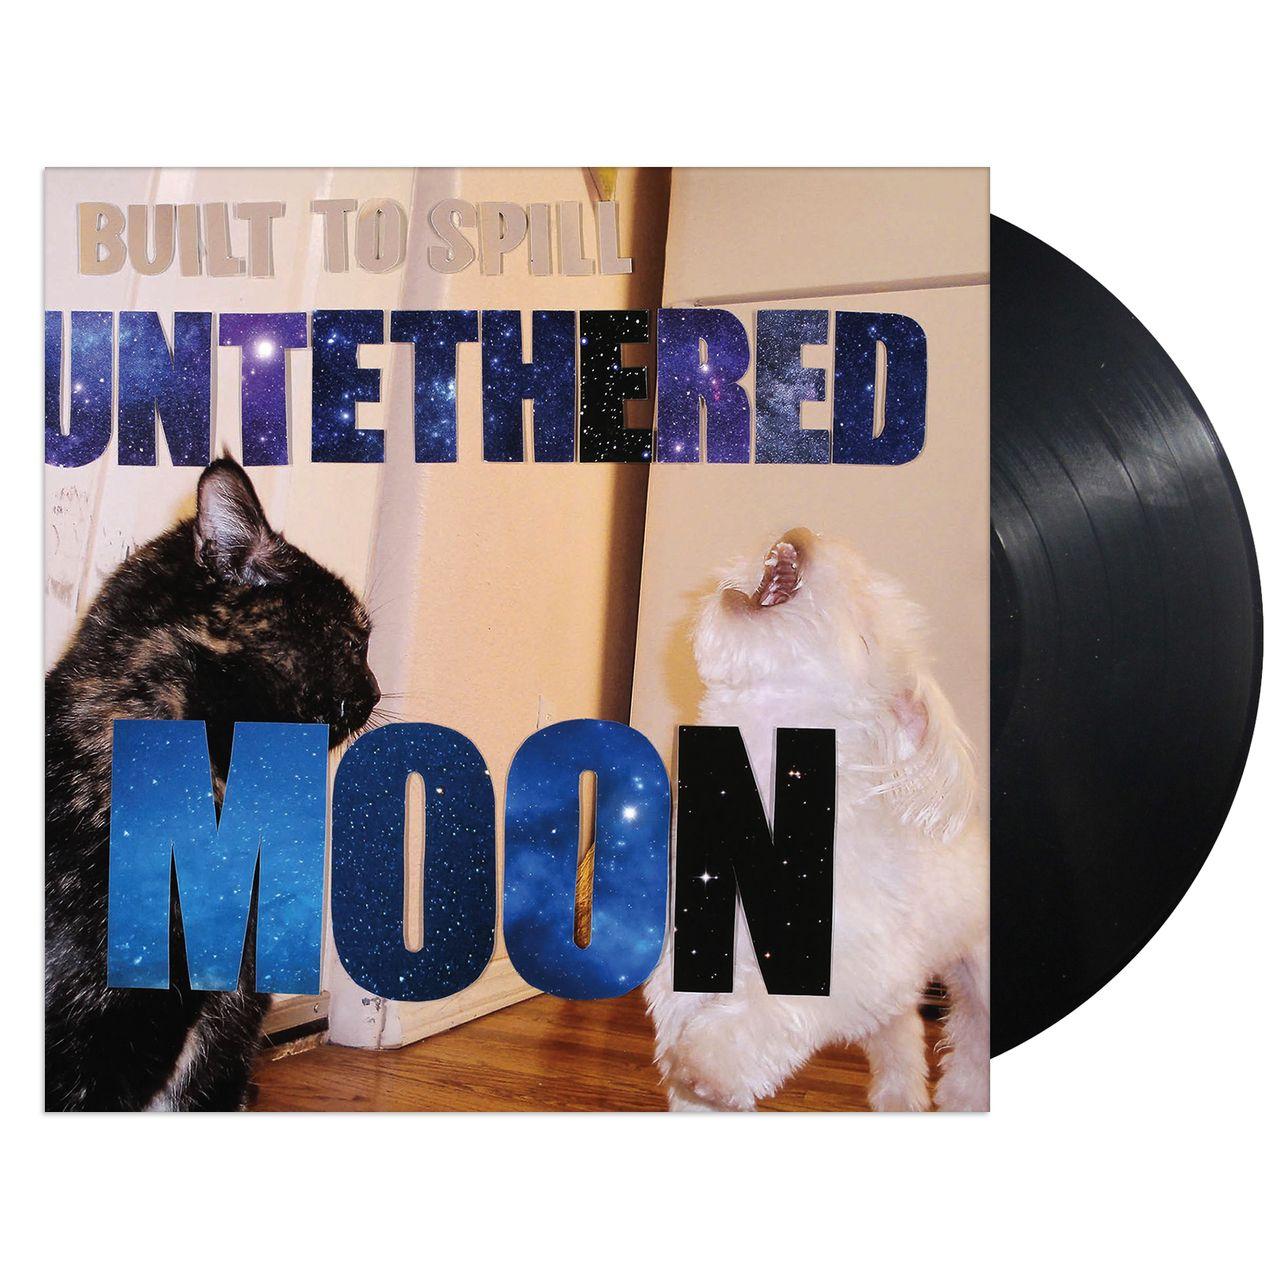 Lazy Labrador Records Built To Spill Untethered Moon Vinyl Lp Black 19 89 Http Lazylabradorrecords Com Built Built To Spill Record Store Lp Vinyl